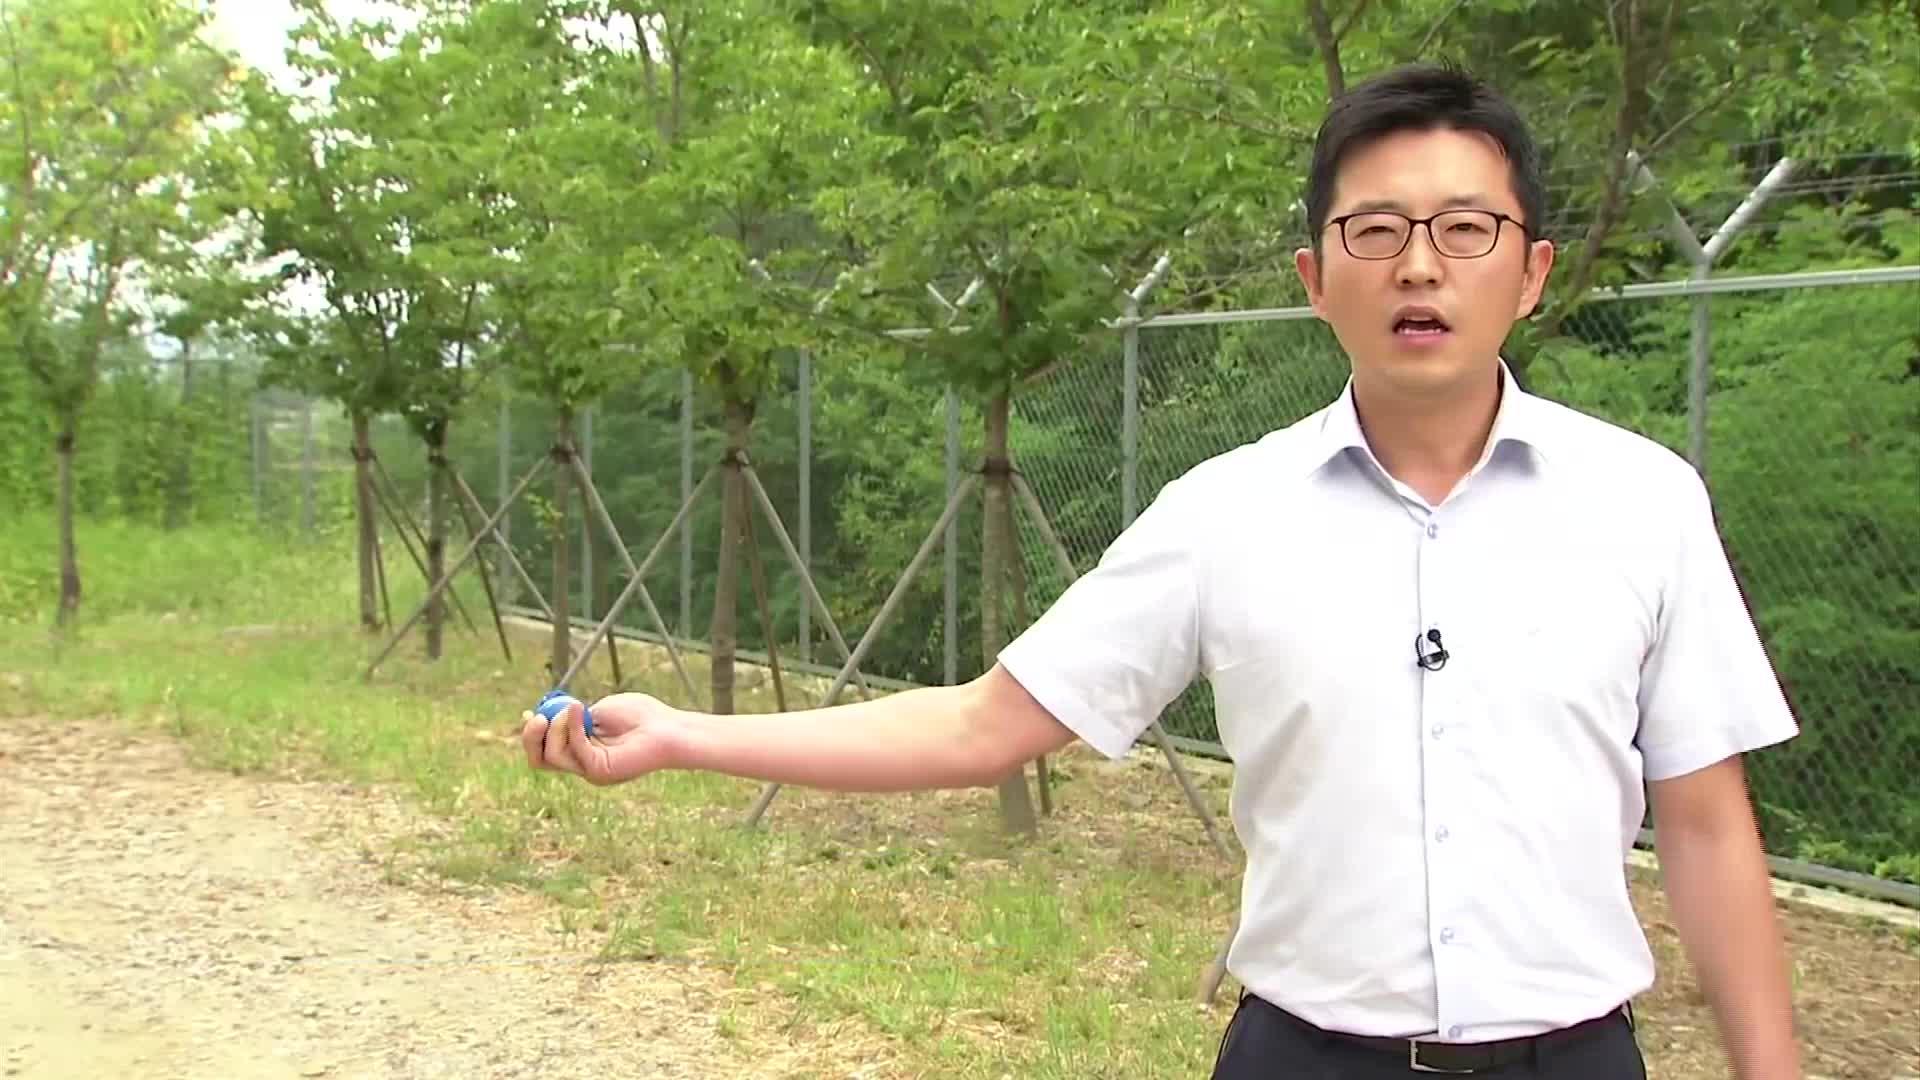 korea, military, militarygfys, south korea, K417 Practice Hand Grenade GIFs